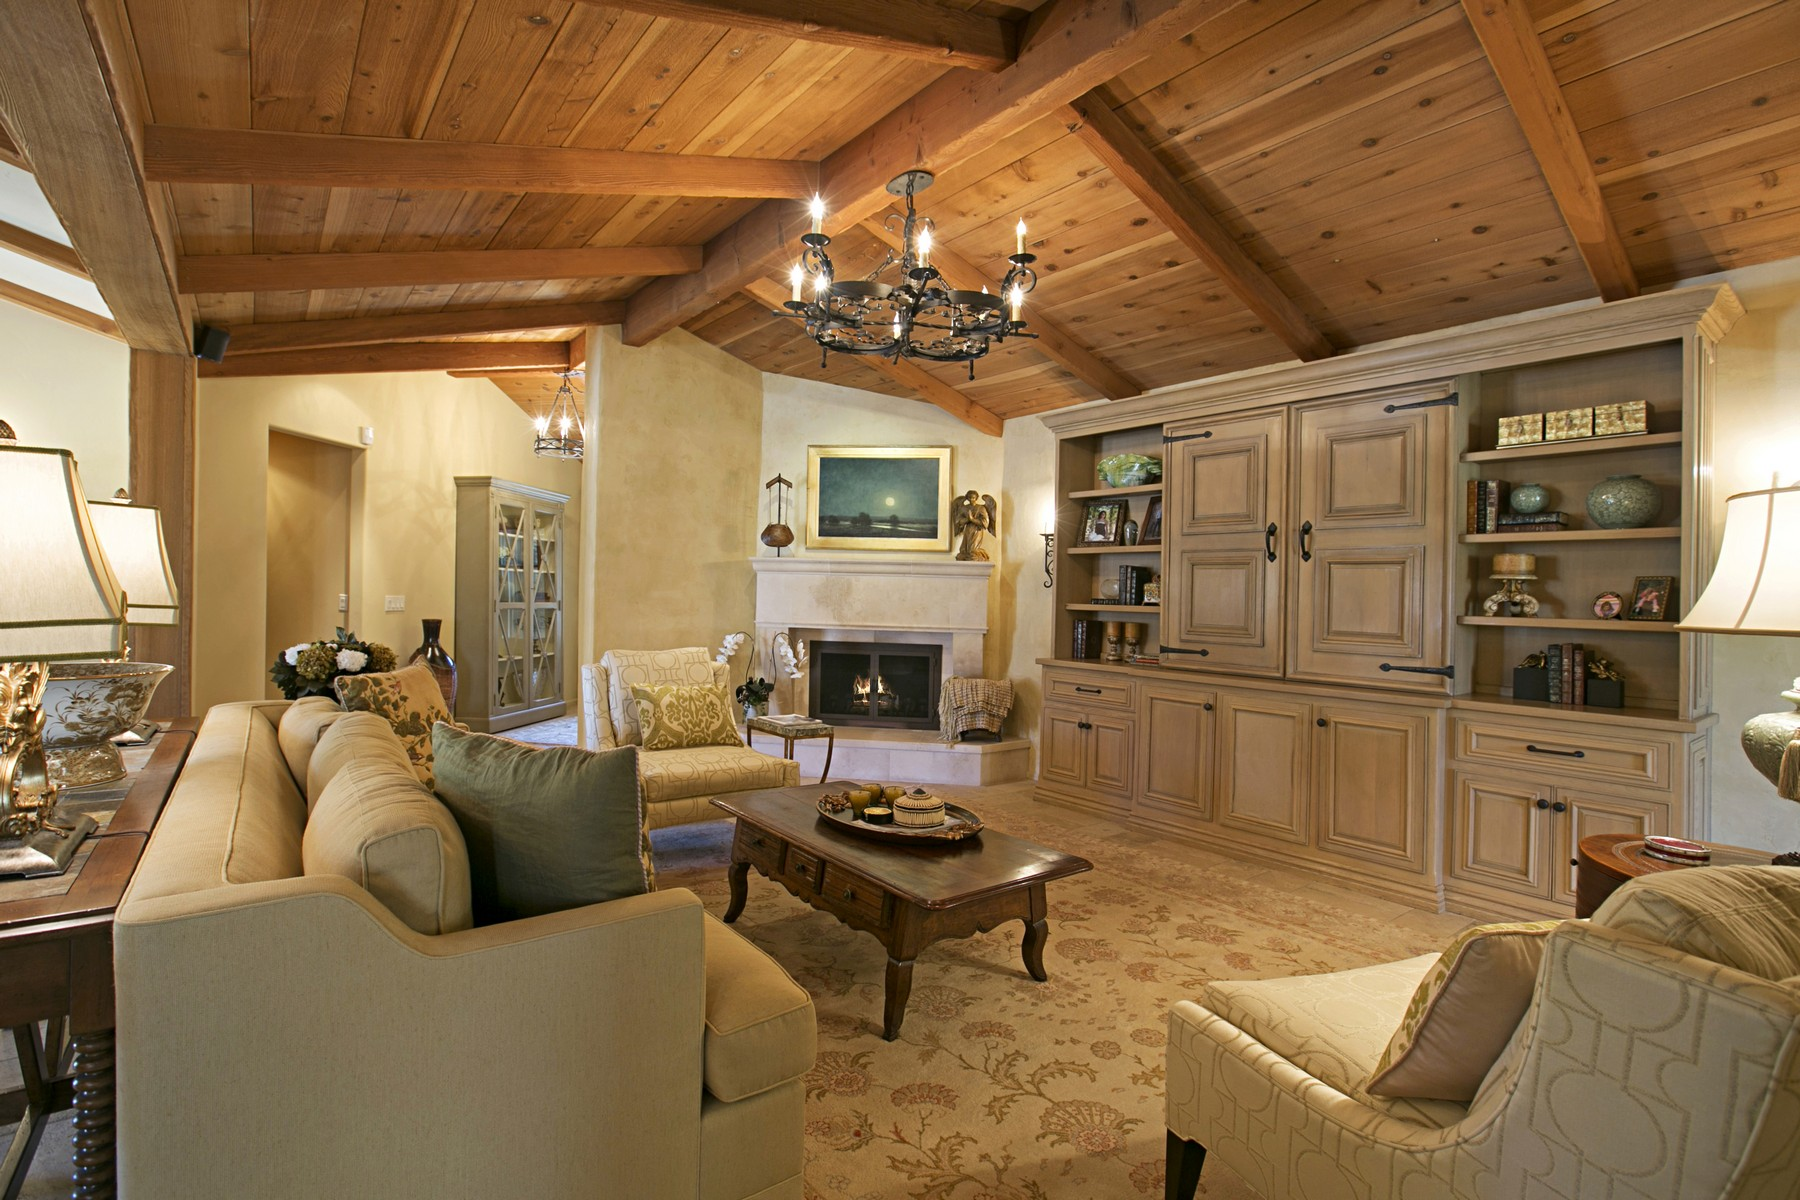 Single Family Home for Sale at 6101 Camino Selva Rancho Santa Fe, California, 92067 United States